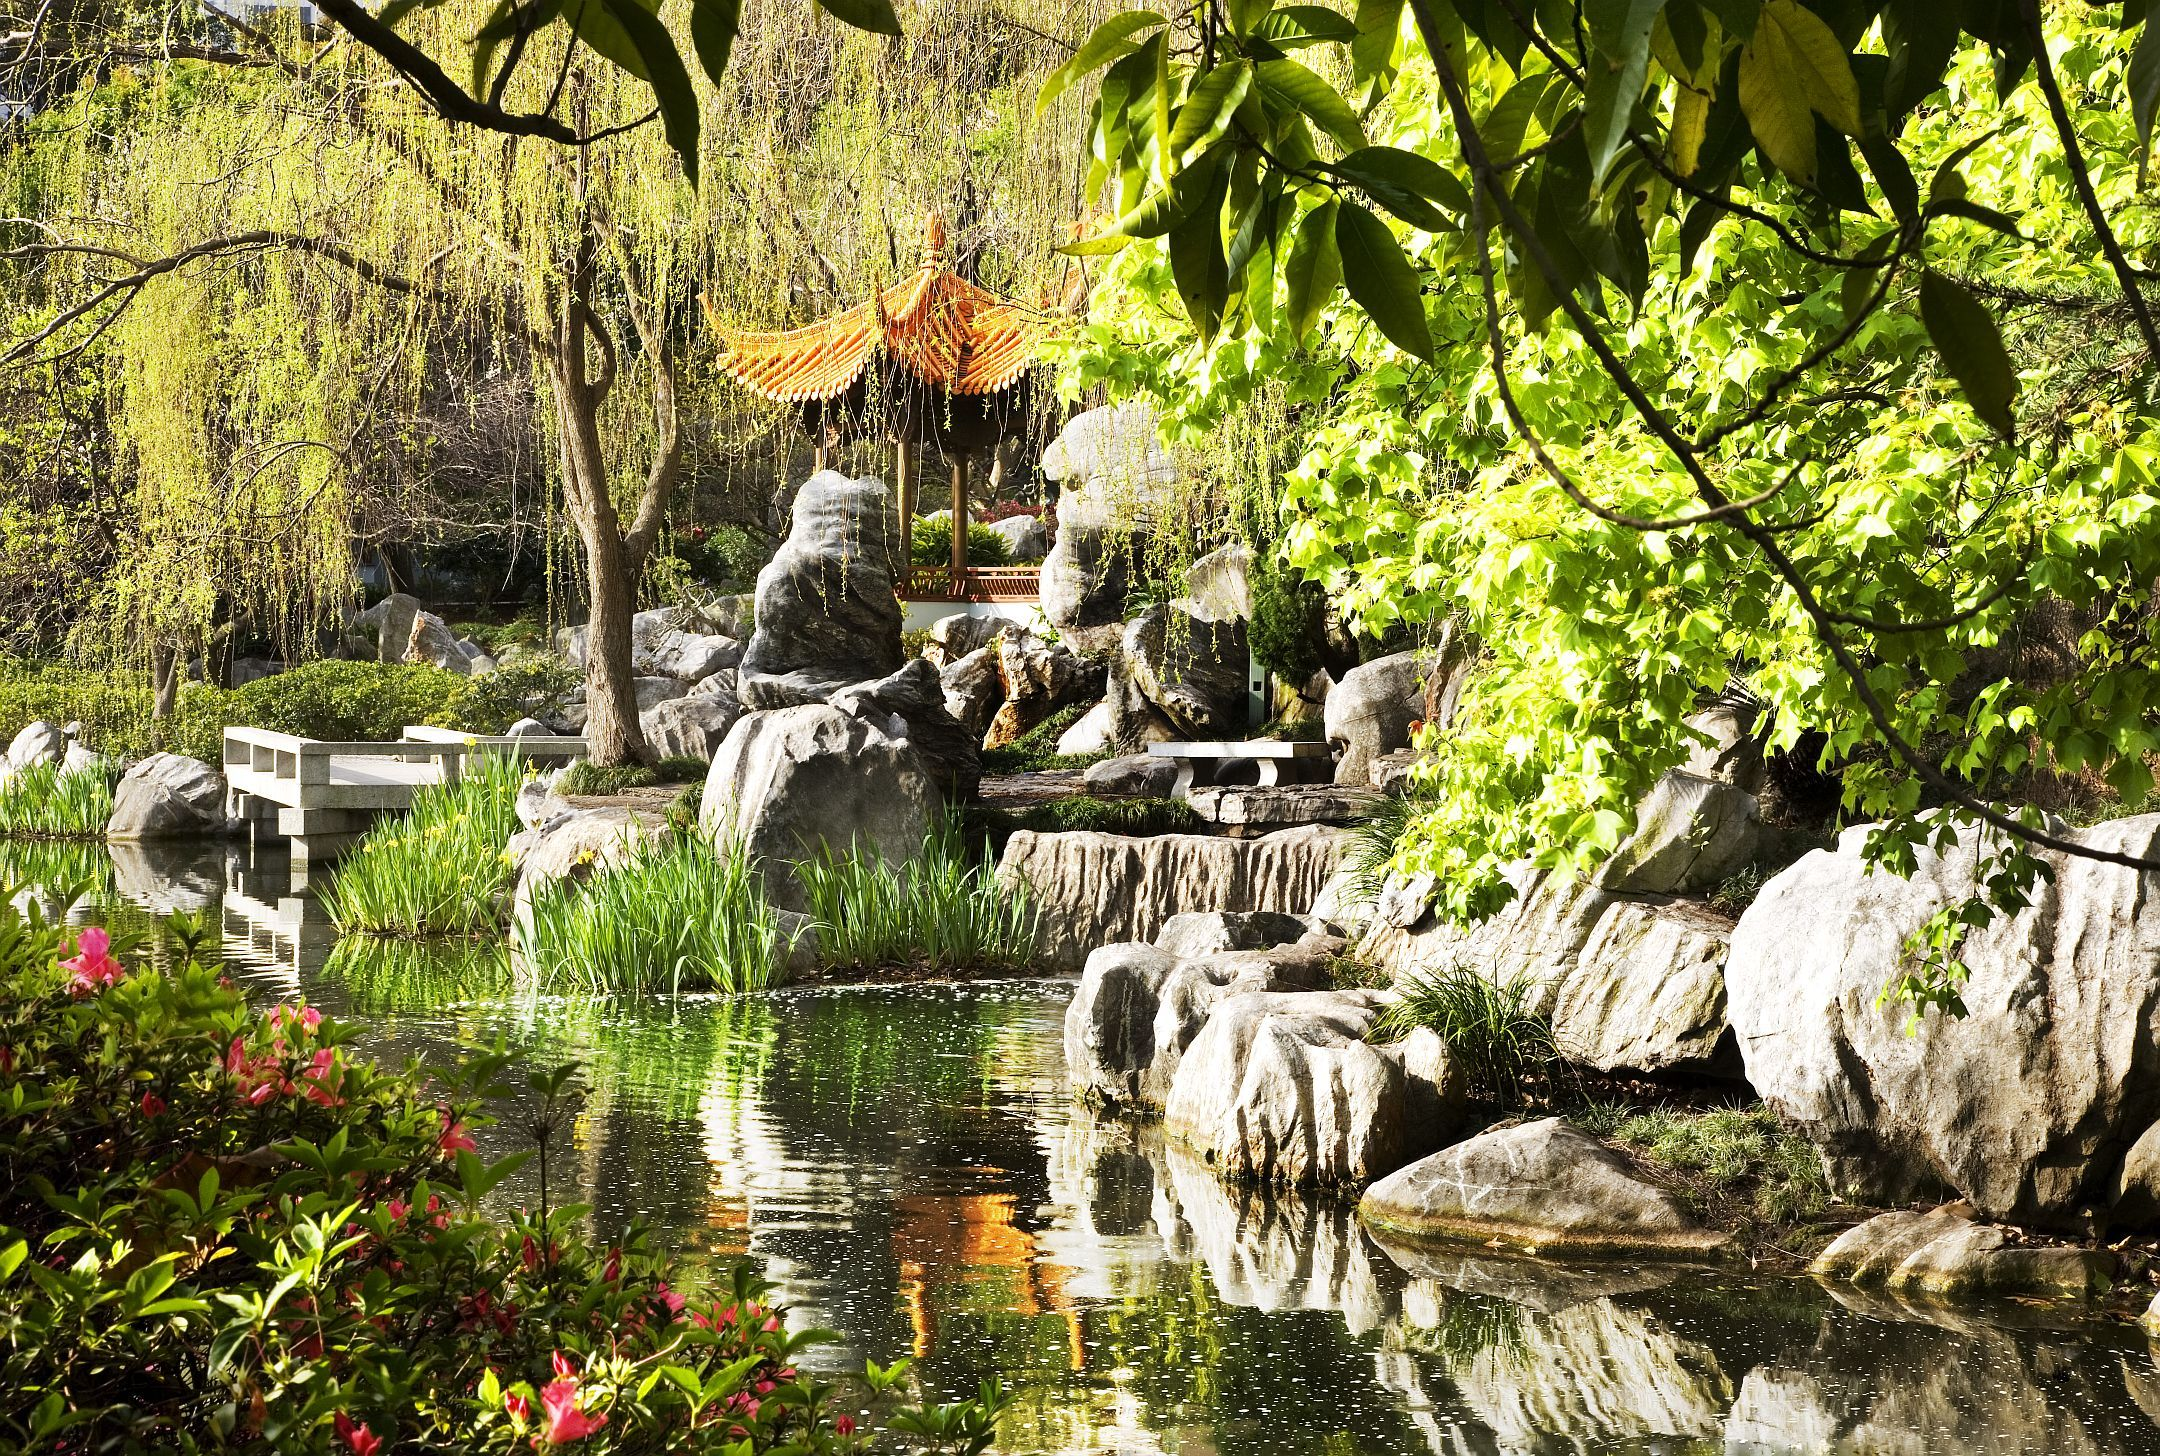 chinese garden of friendship sydney, australia Chinese